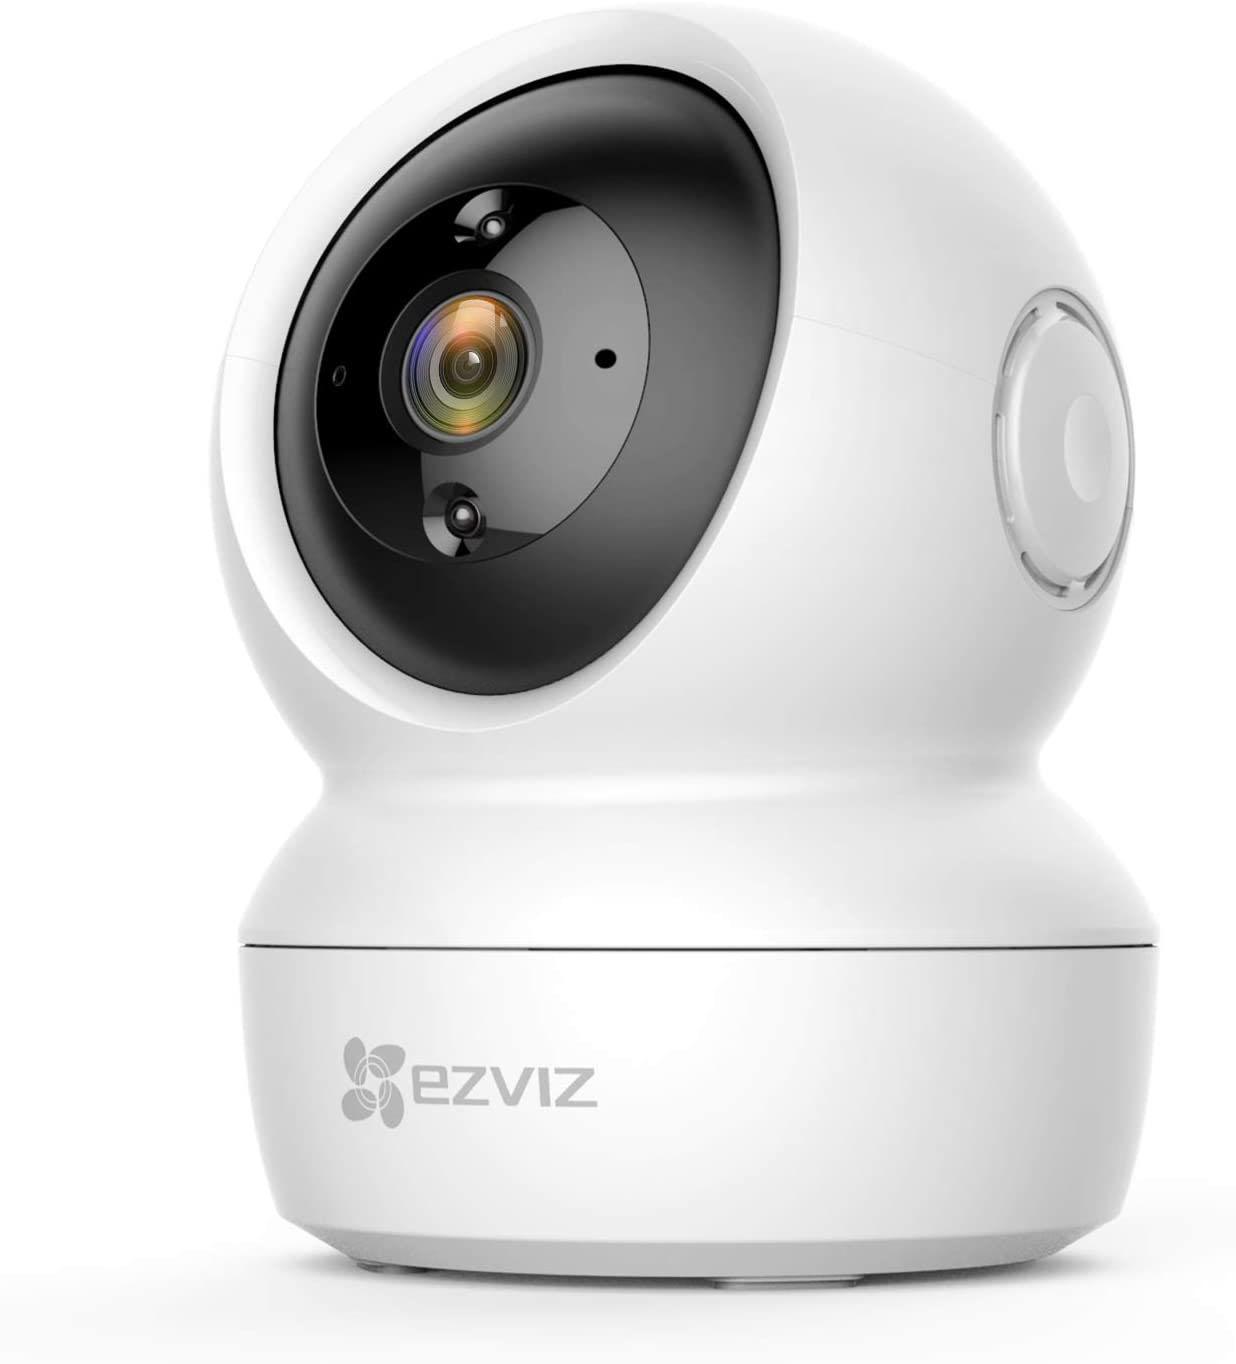 EZVIZ surveillance camera